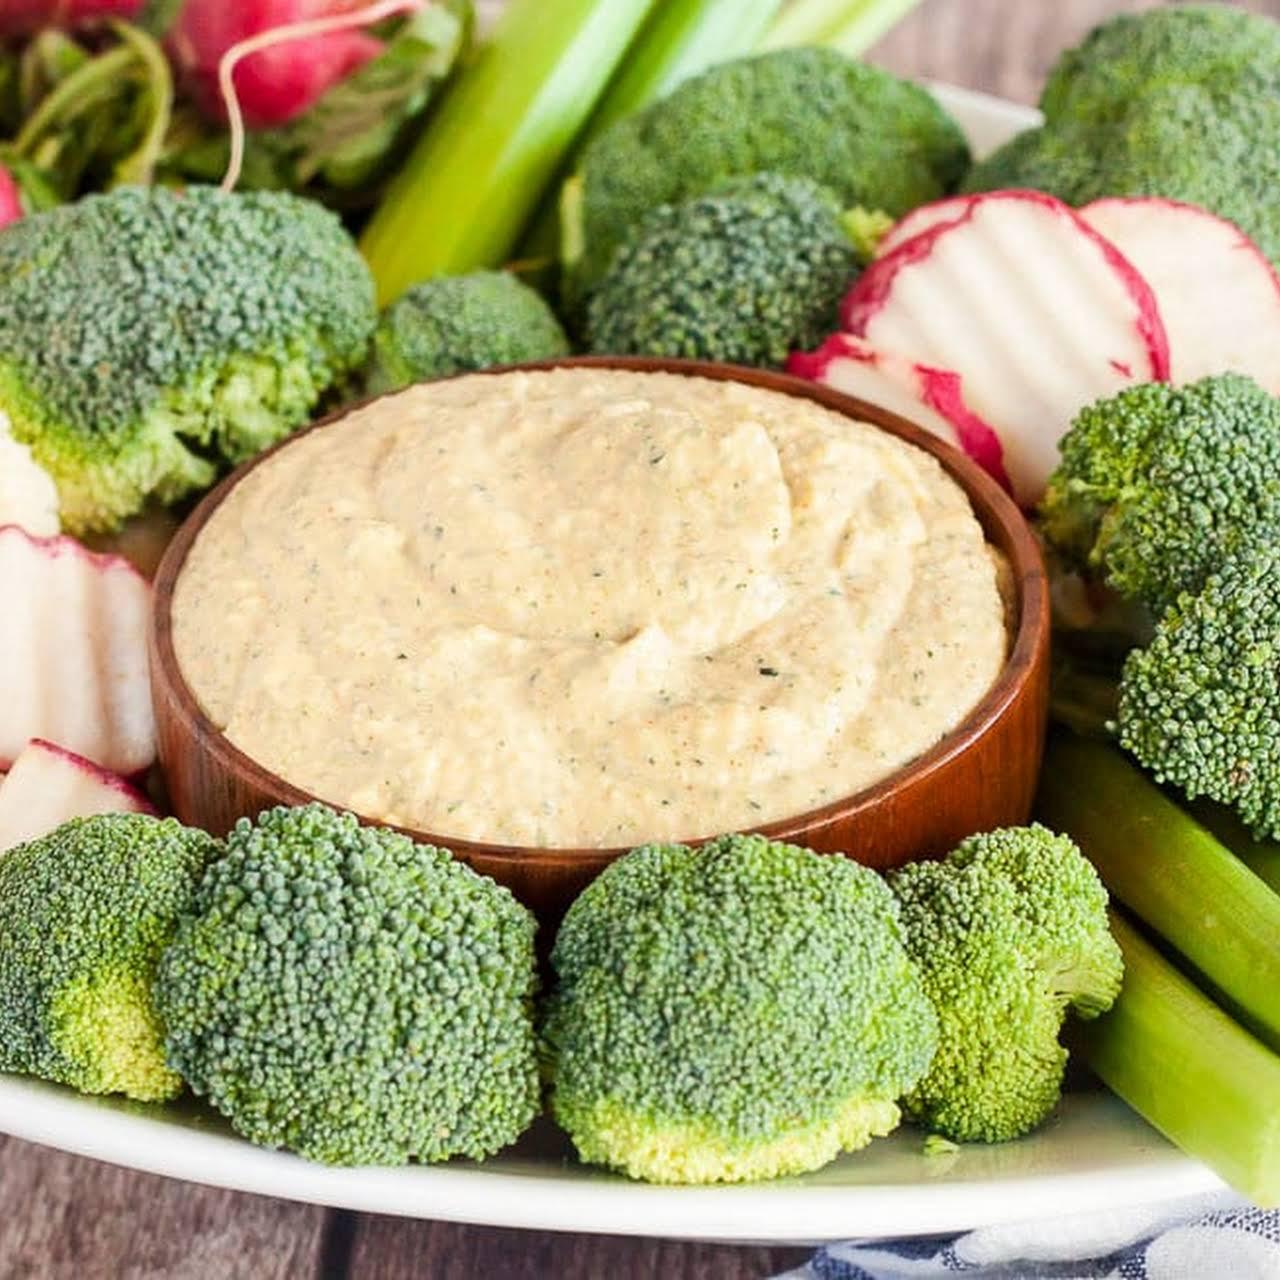 Keto Hummus (with a Secret Ingredient!)